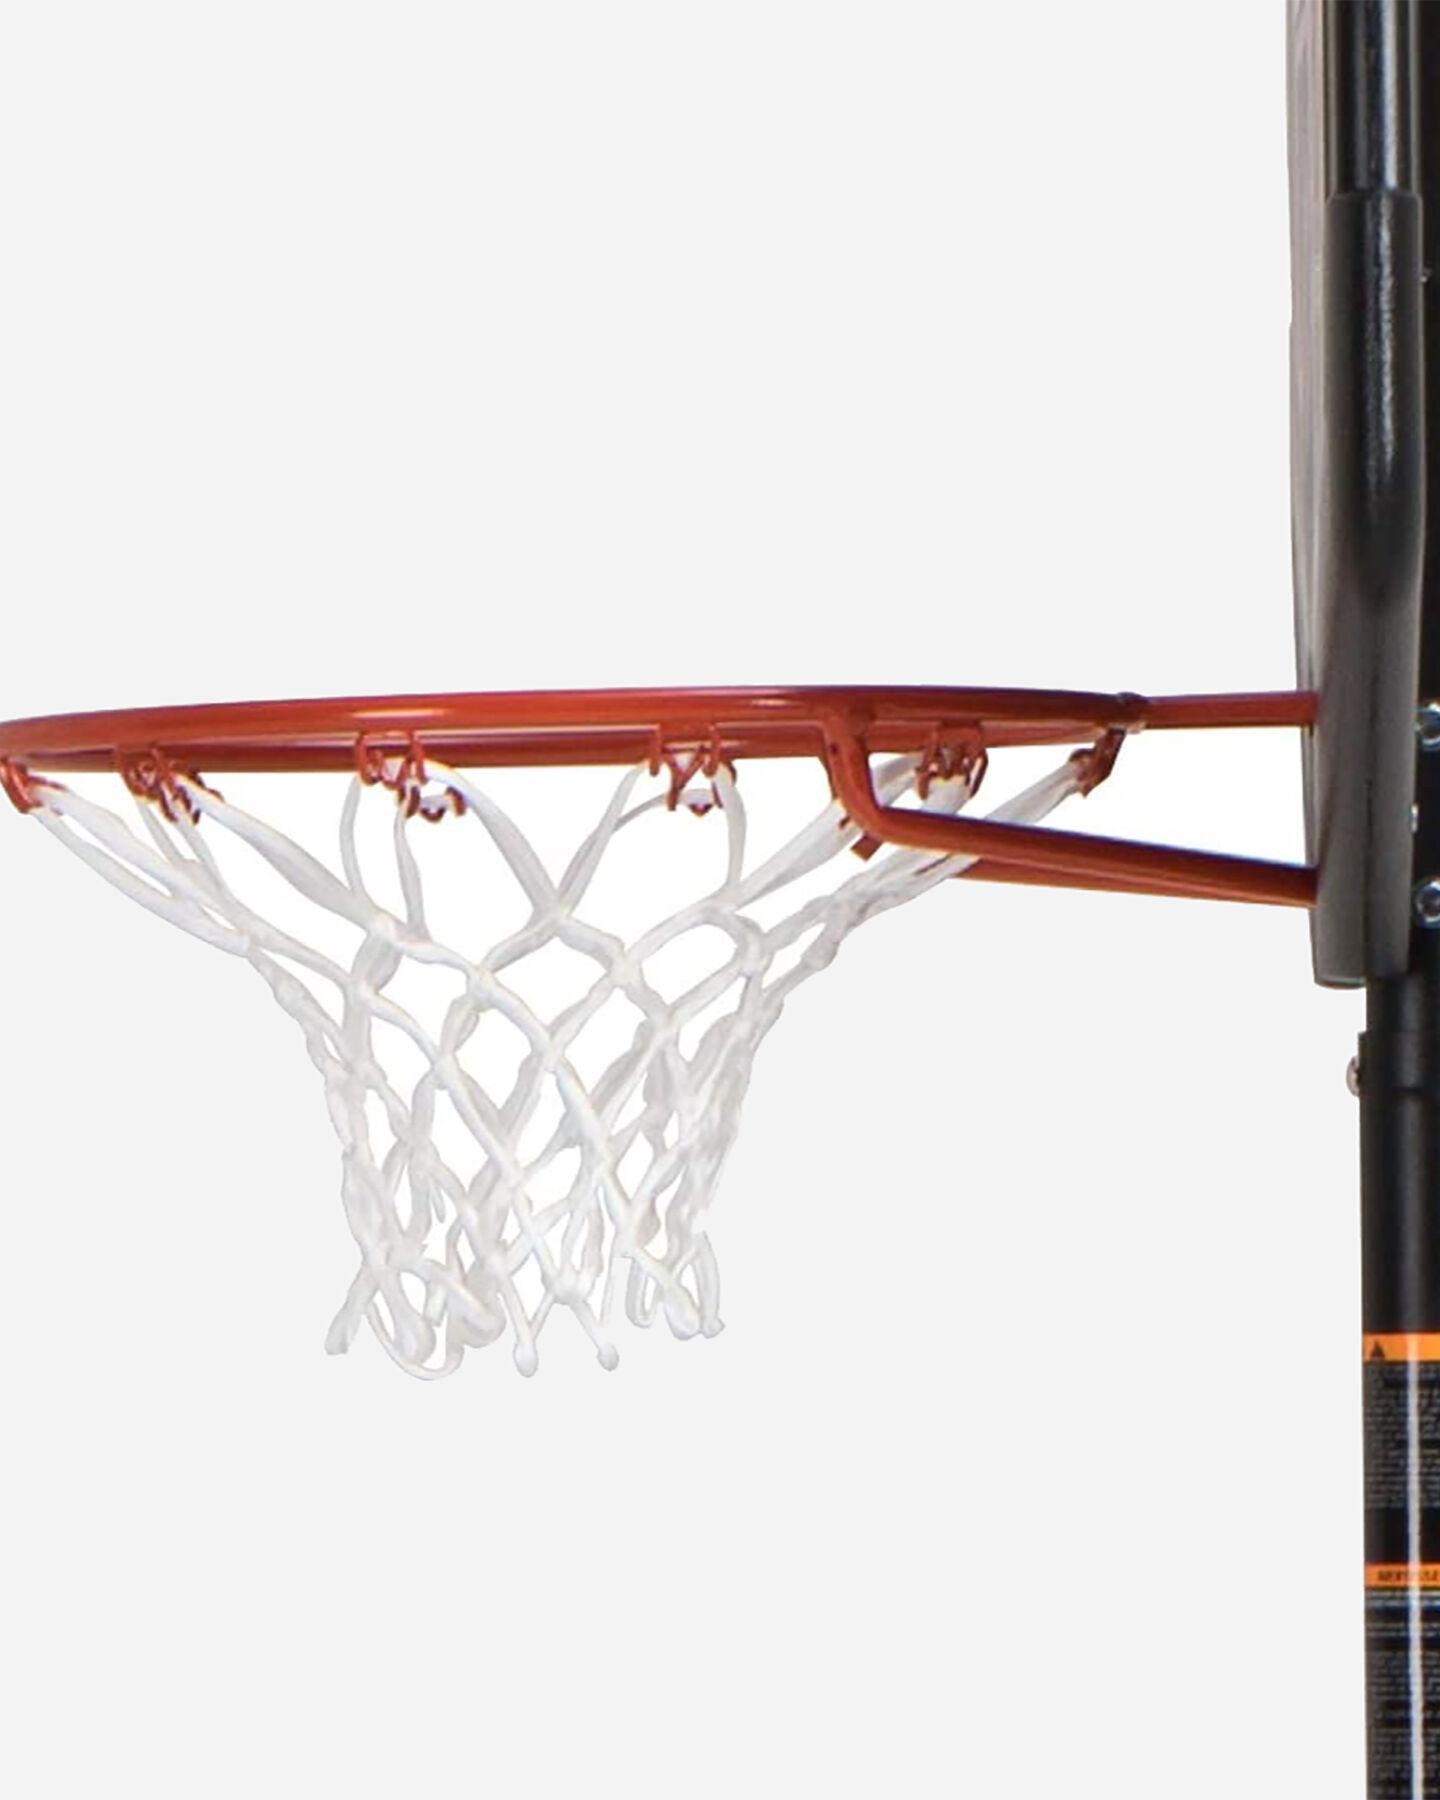 Attrezzatura basket LIFETIME IMPIANTO BASKET JR S2000549 896 - scatto 2